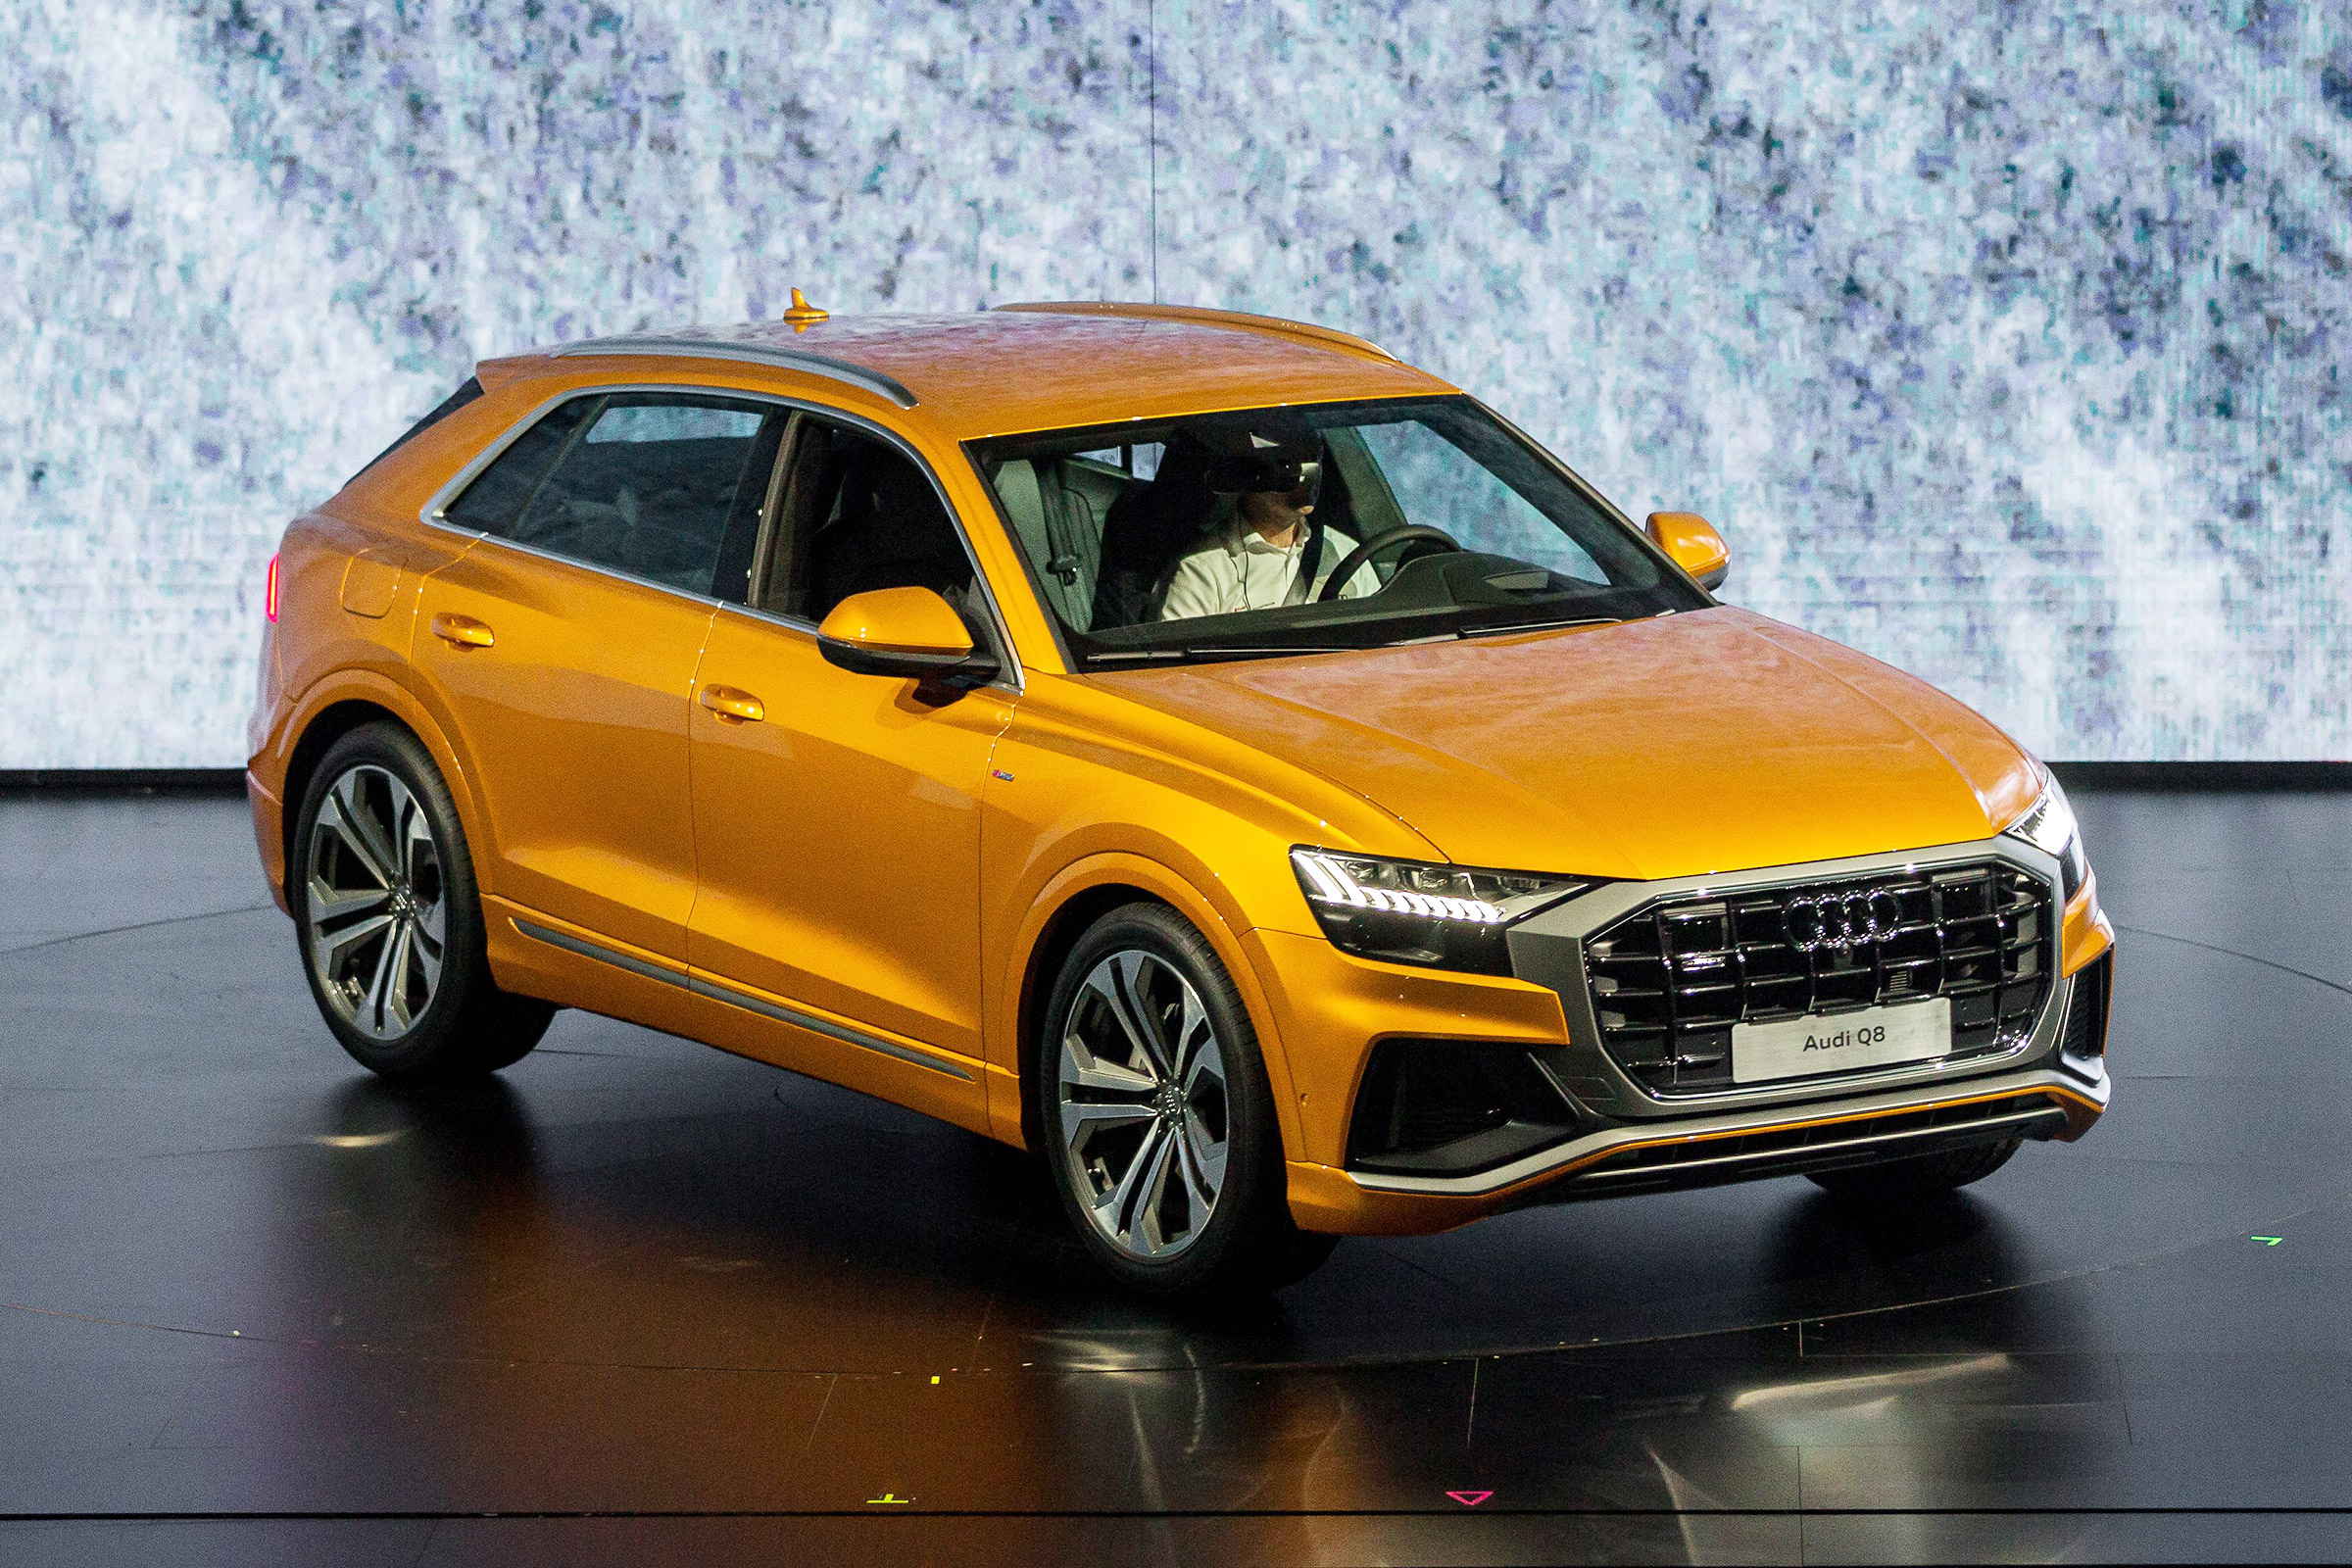 Kelebihan Kekurangan Audi Q8 2018 Murah Berkualitas